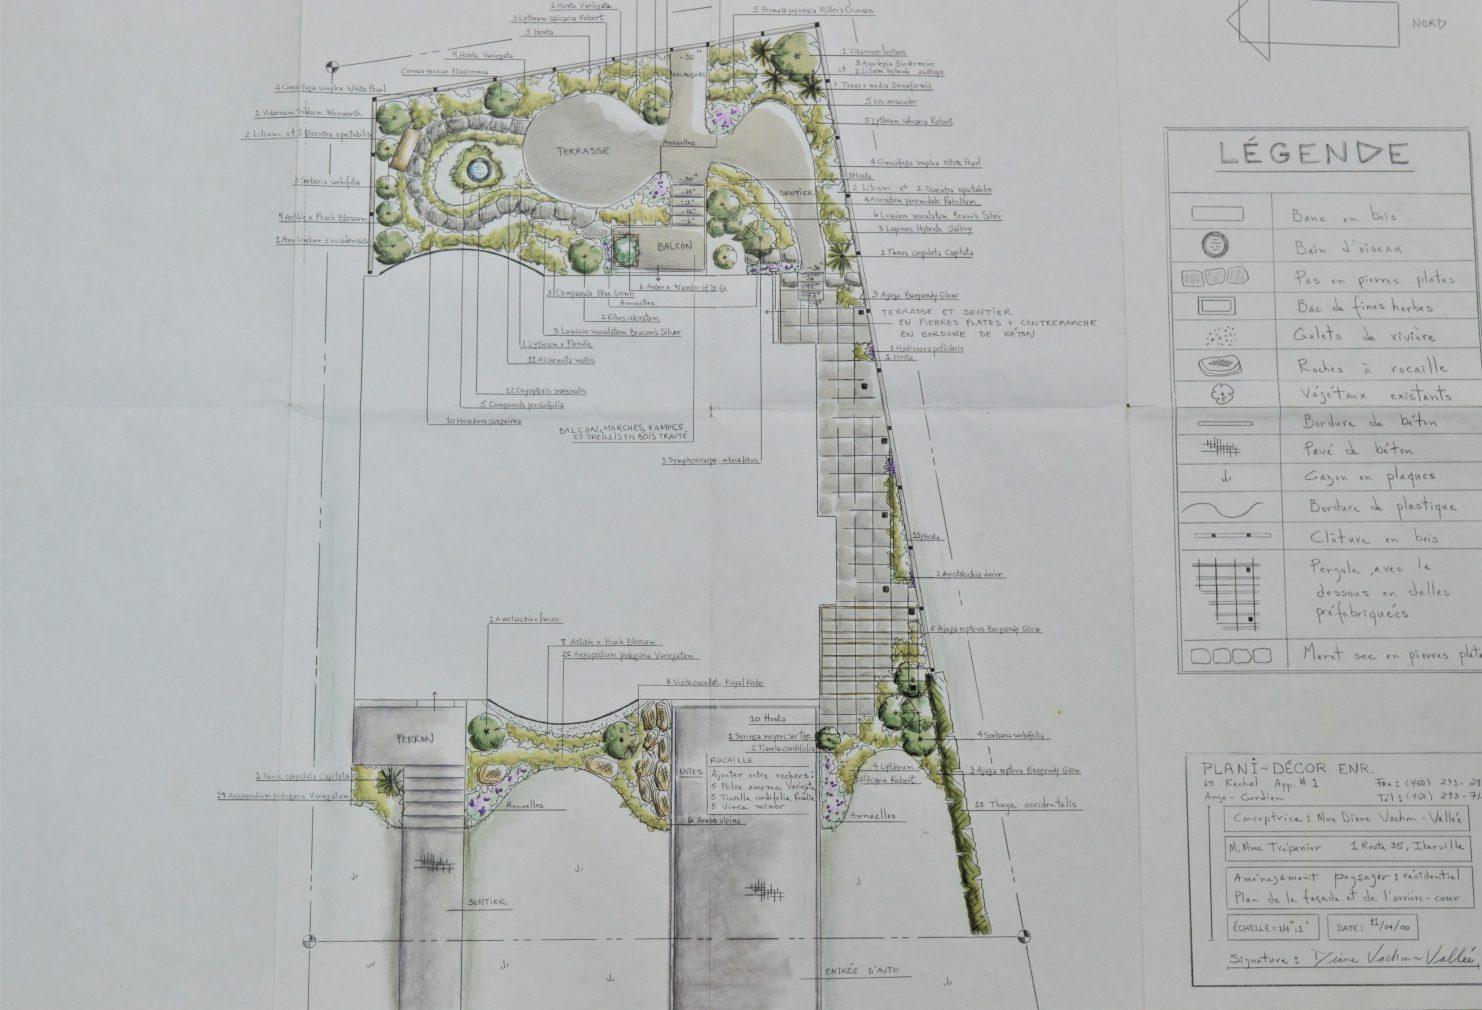 Plani-Décor-Aménagement paysager-Plan 10